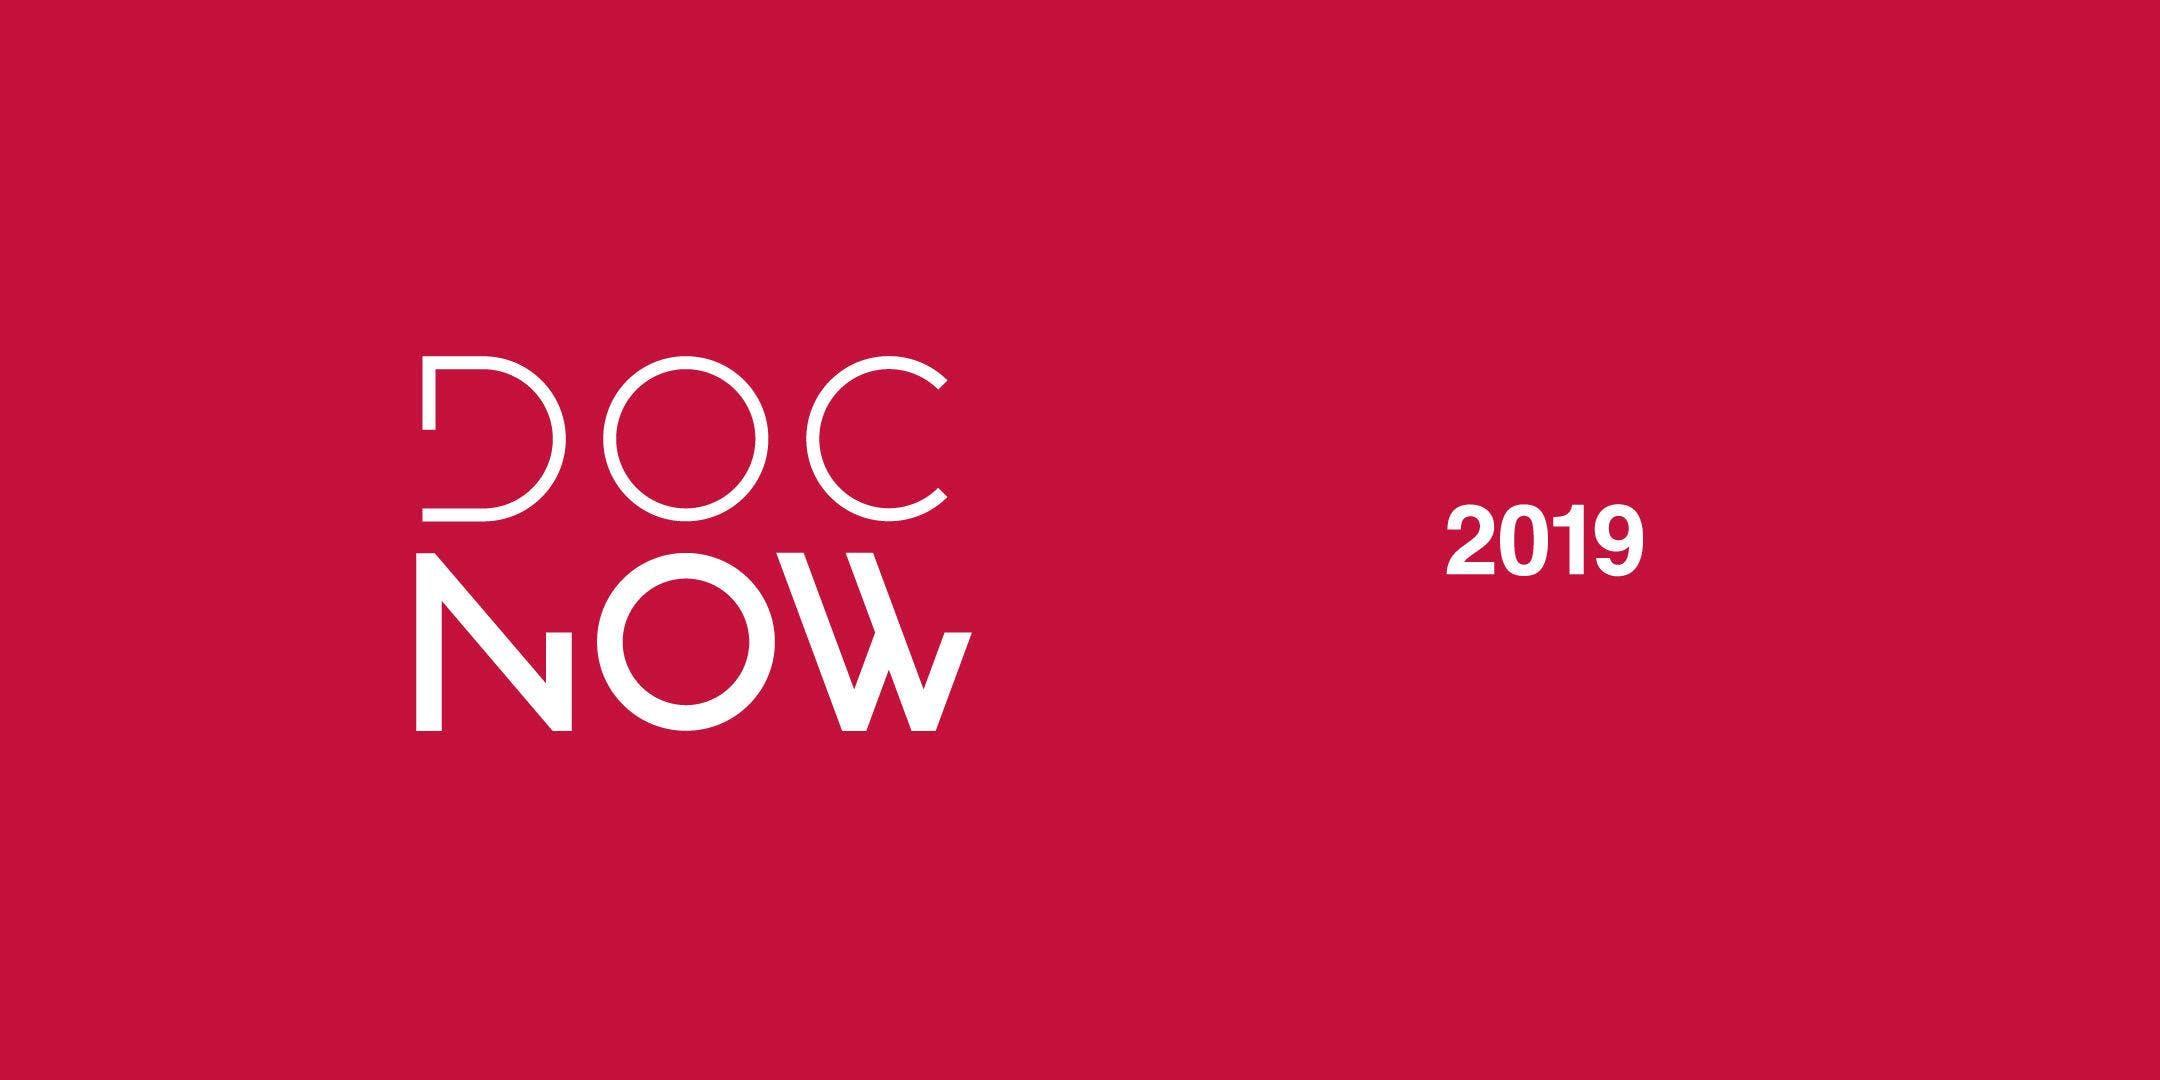 DocNow 2019 Film Screenings